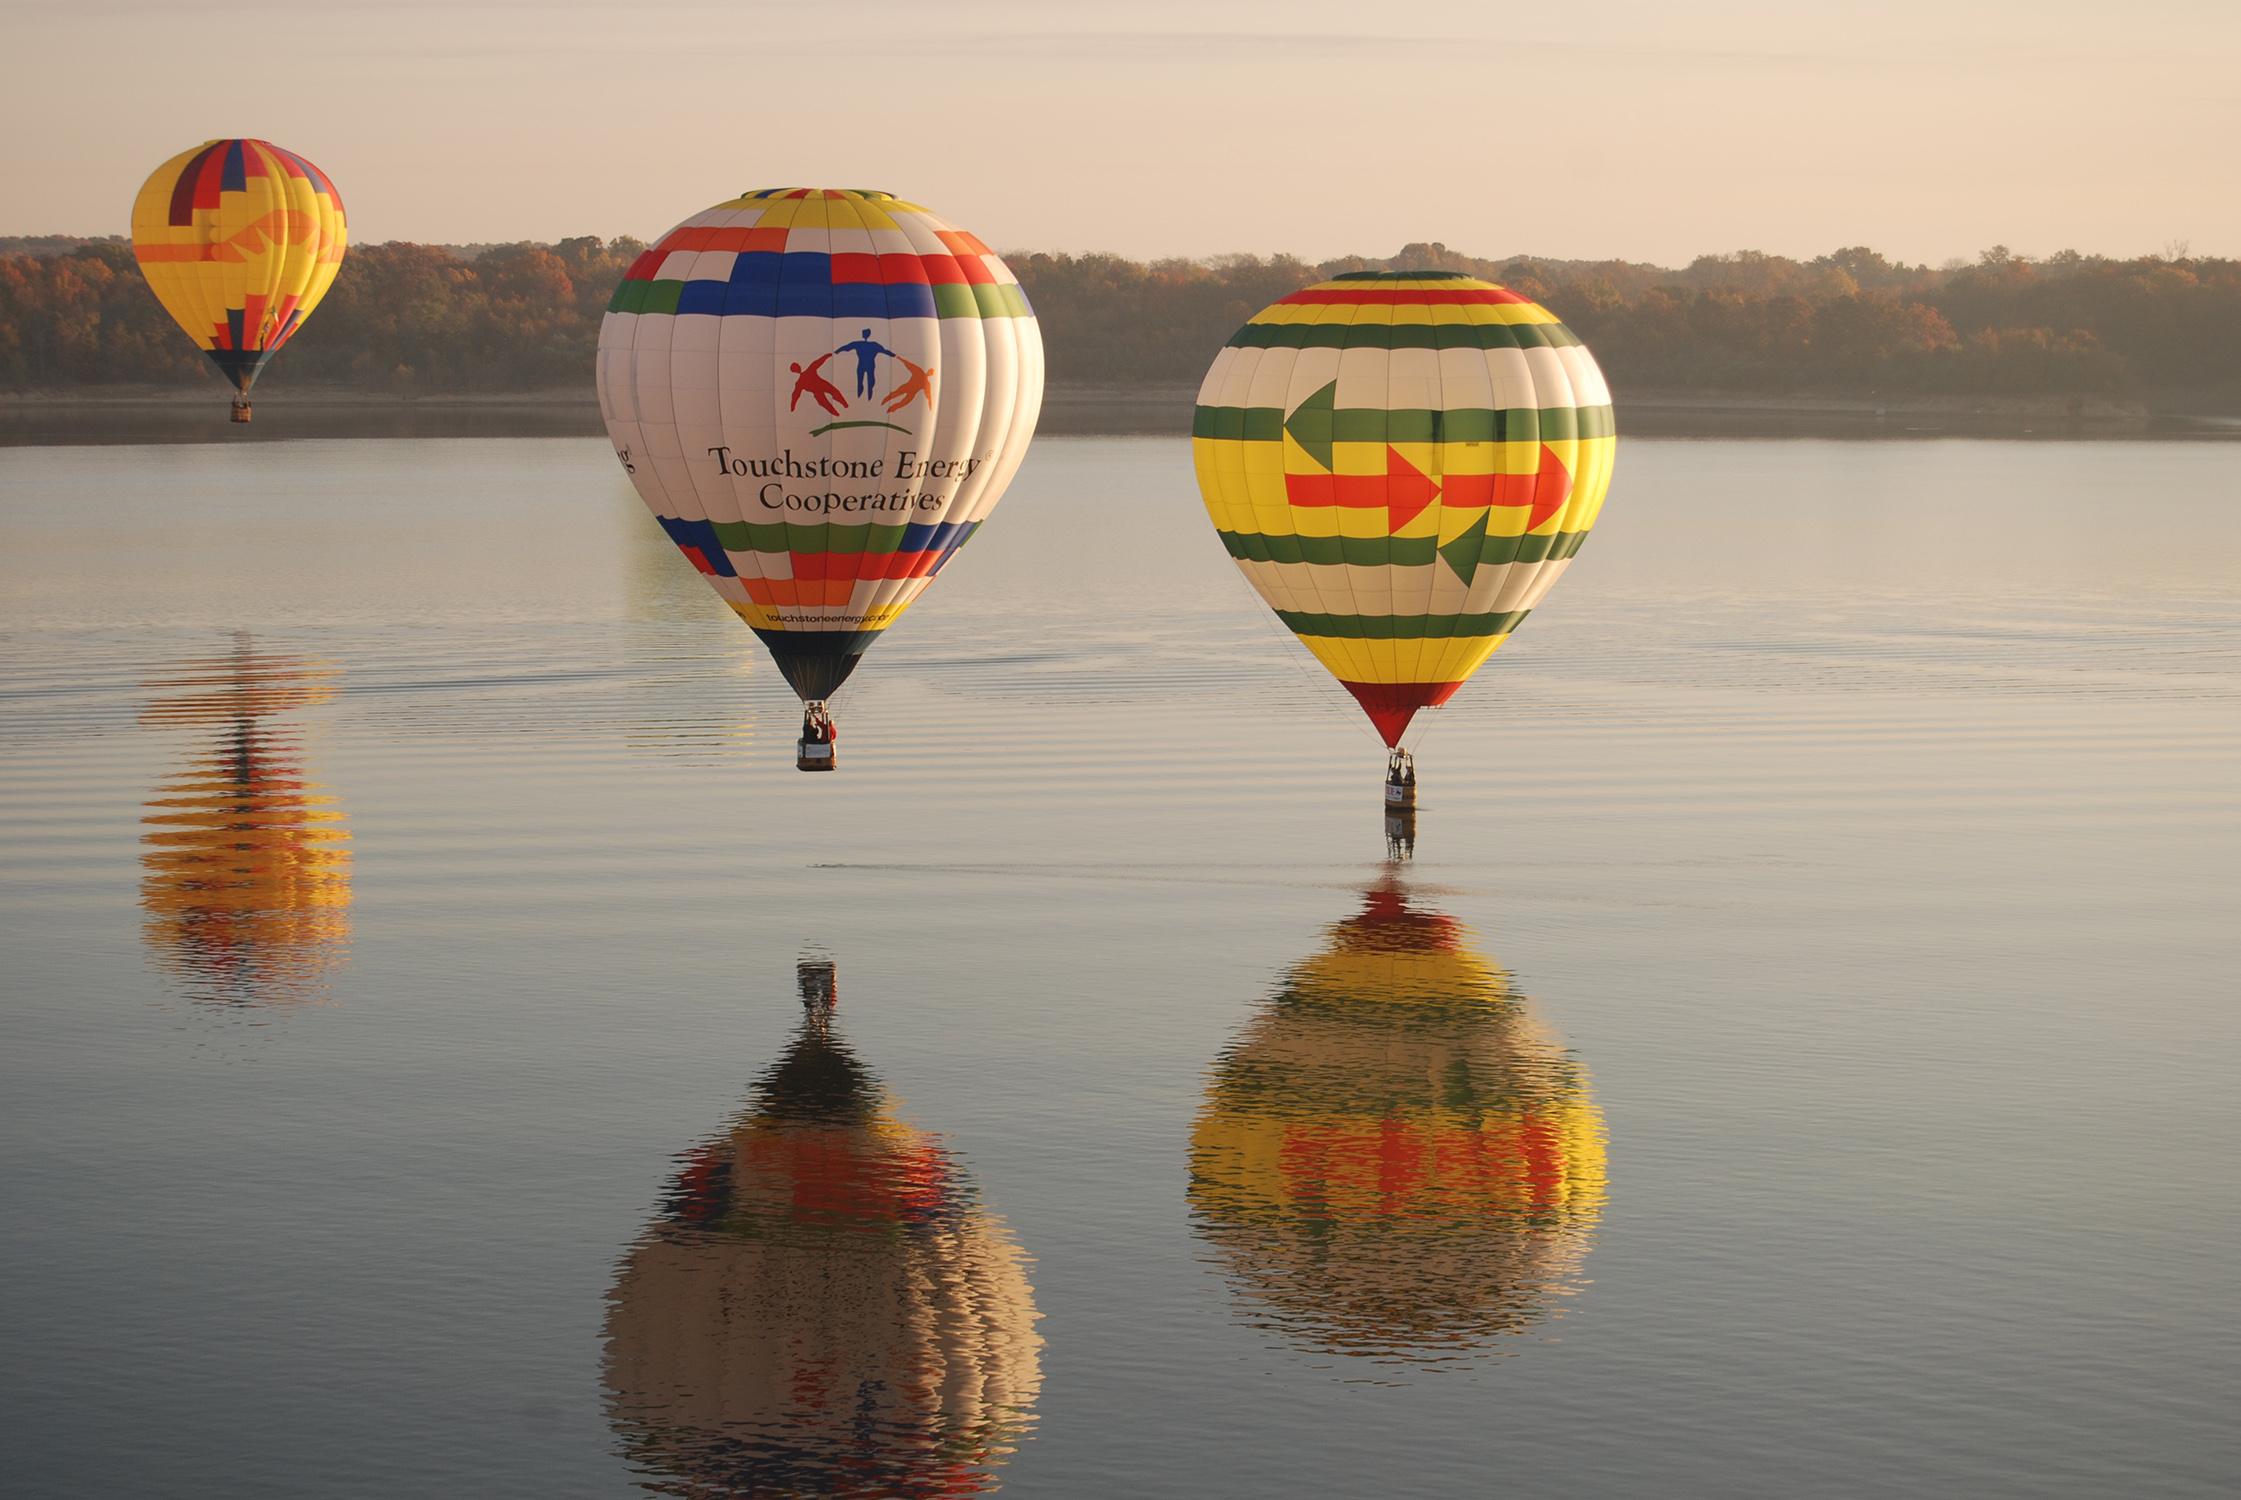 https://cbaballoon.com/sites/default/files/revslider/image/balloons%20over%20water.JPG